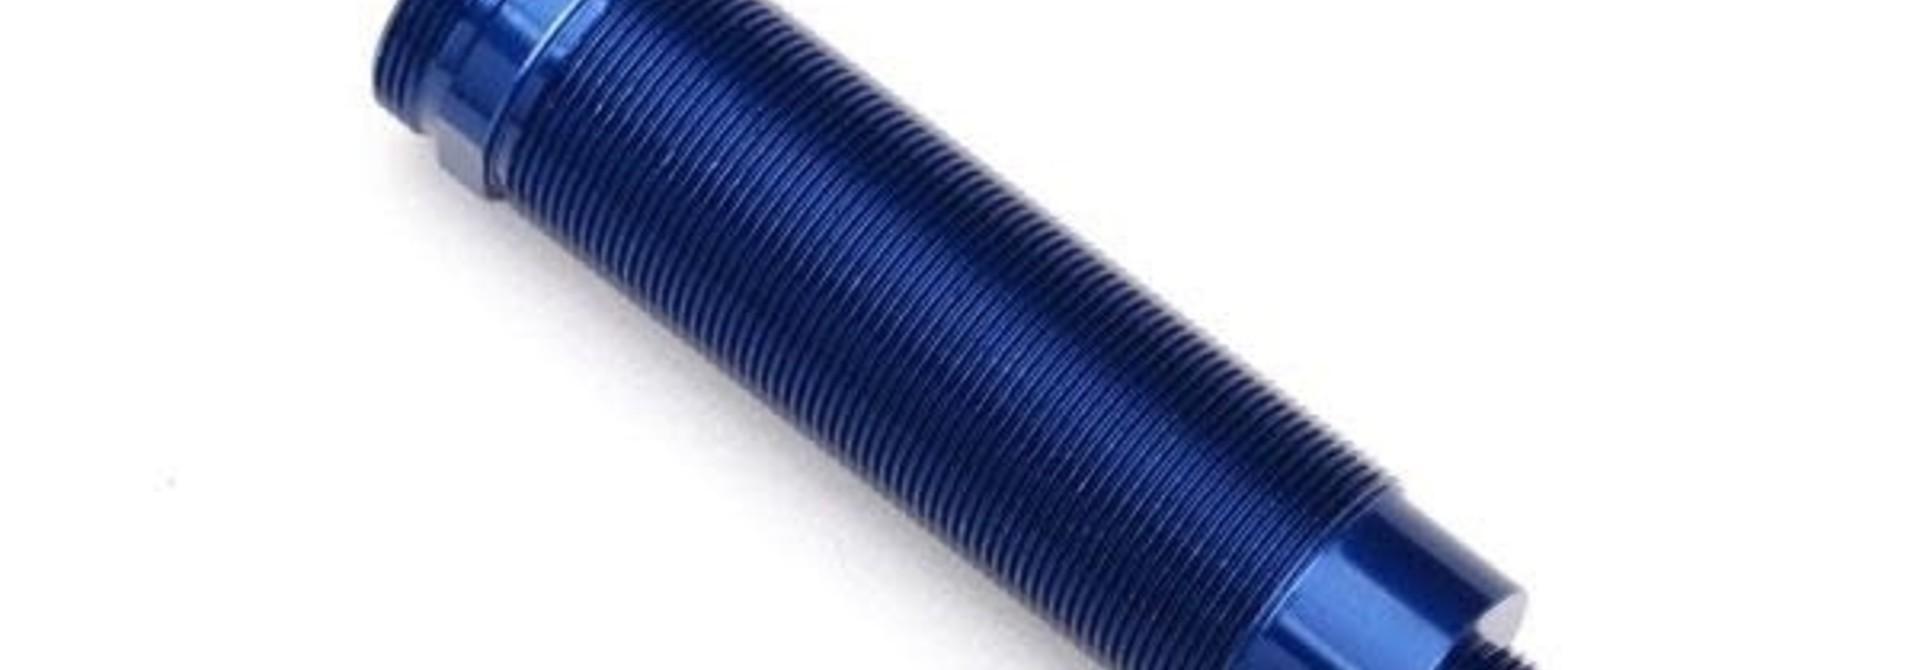 Body, GTR shock, 64mm, aluminum (blue-anodized) (front, threaded)